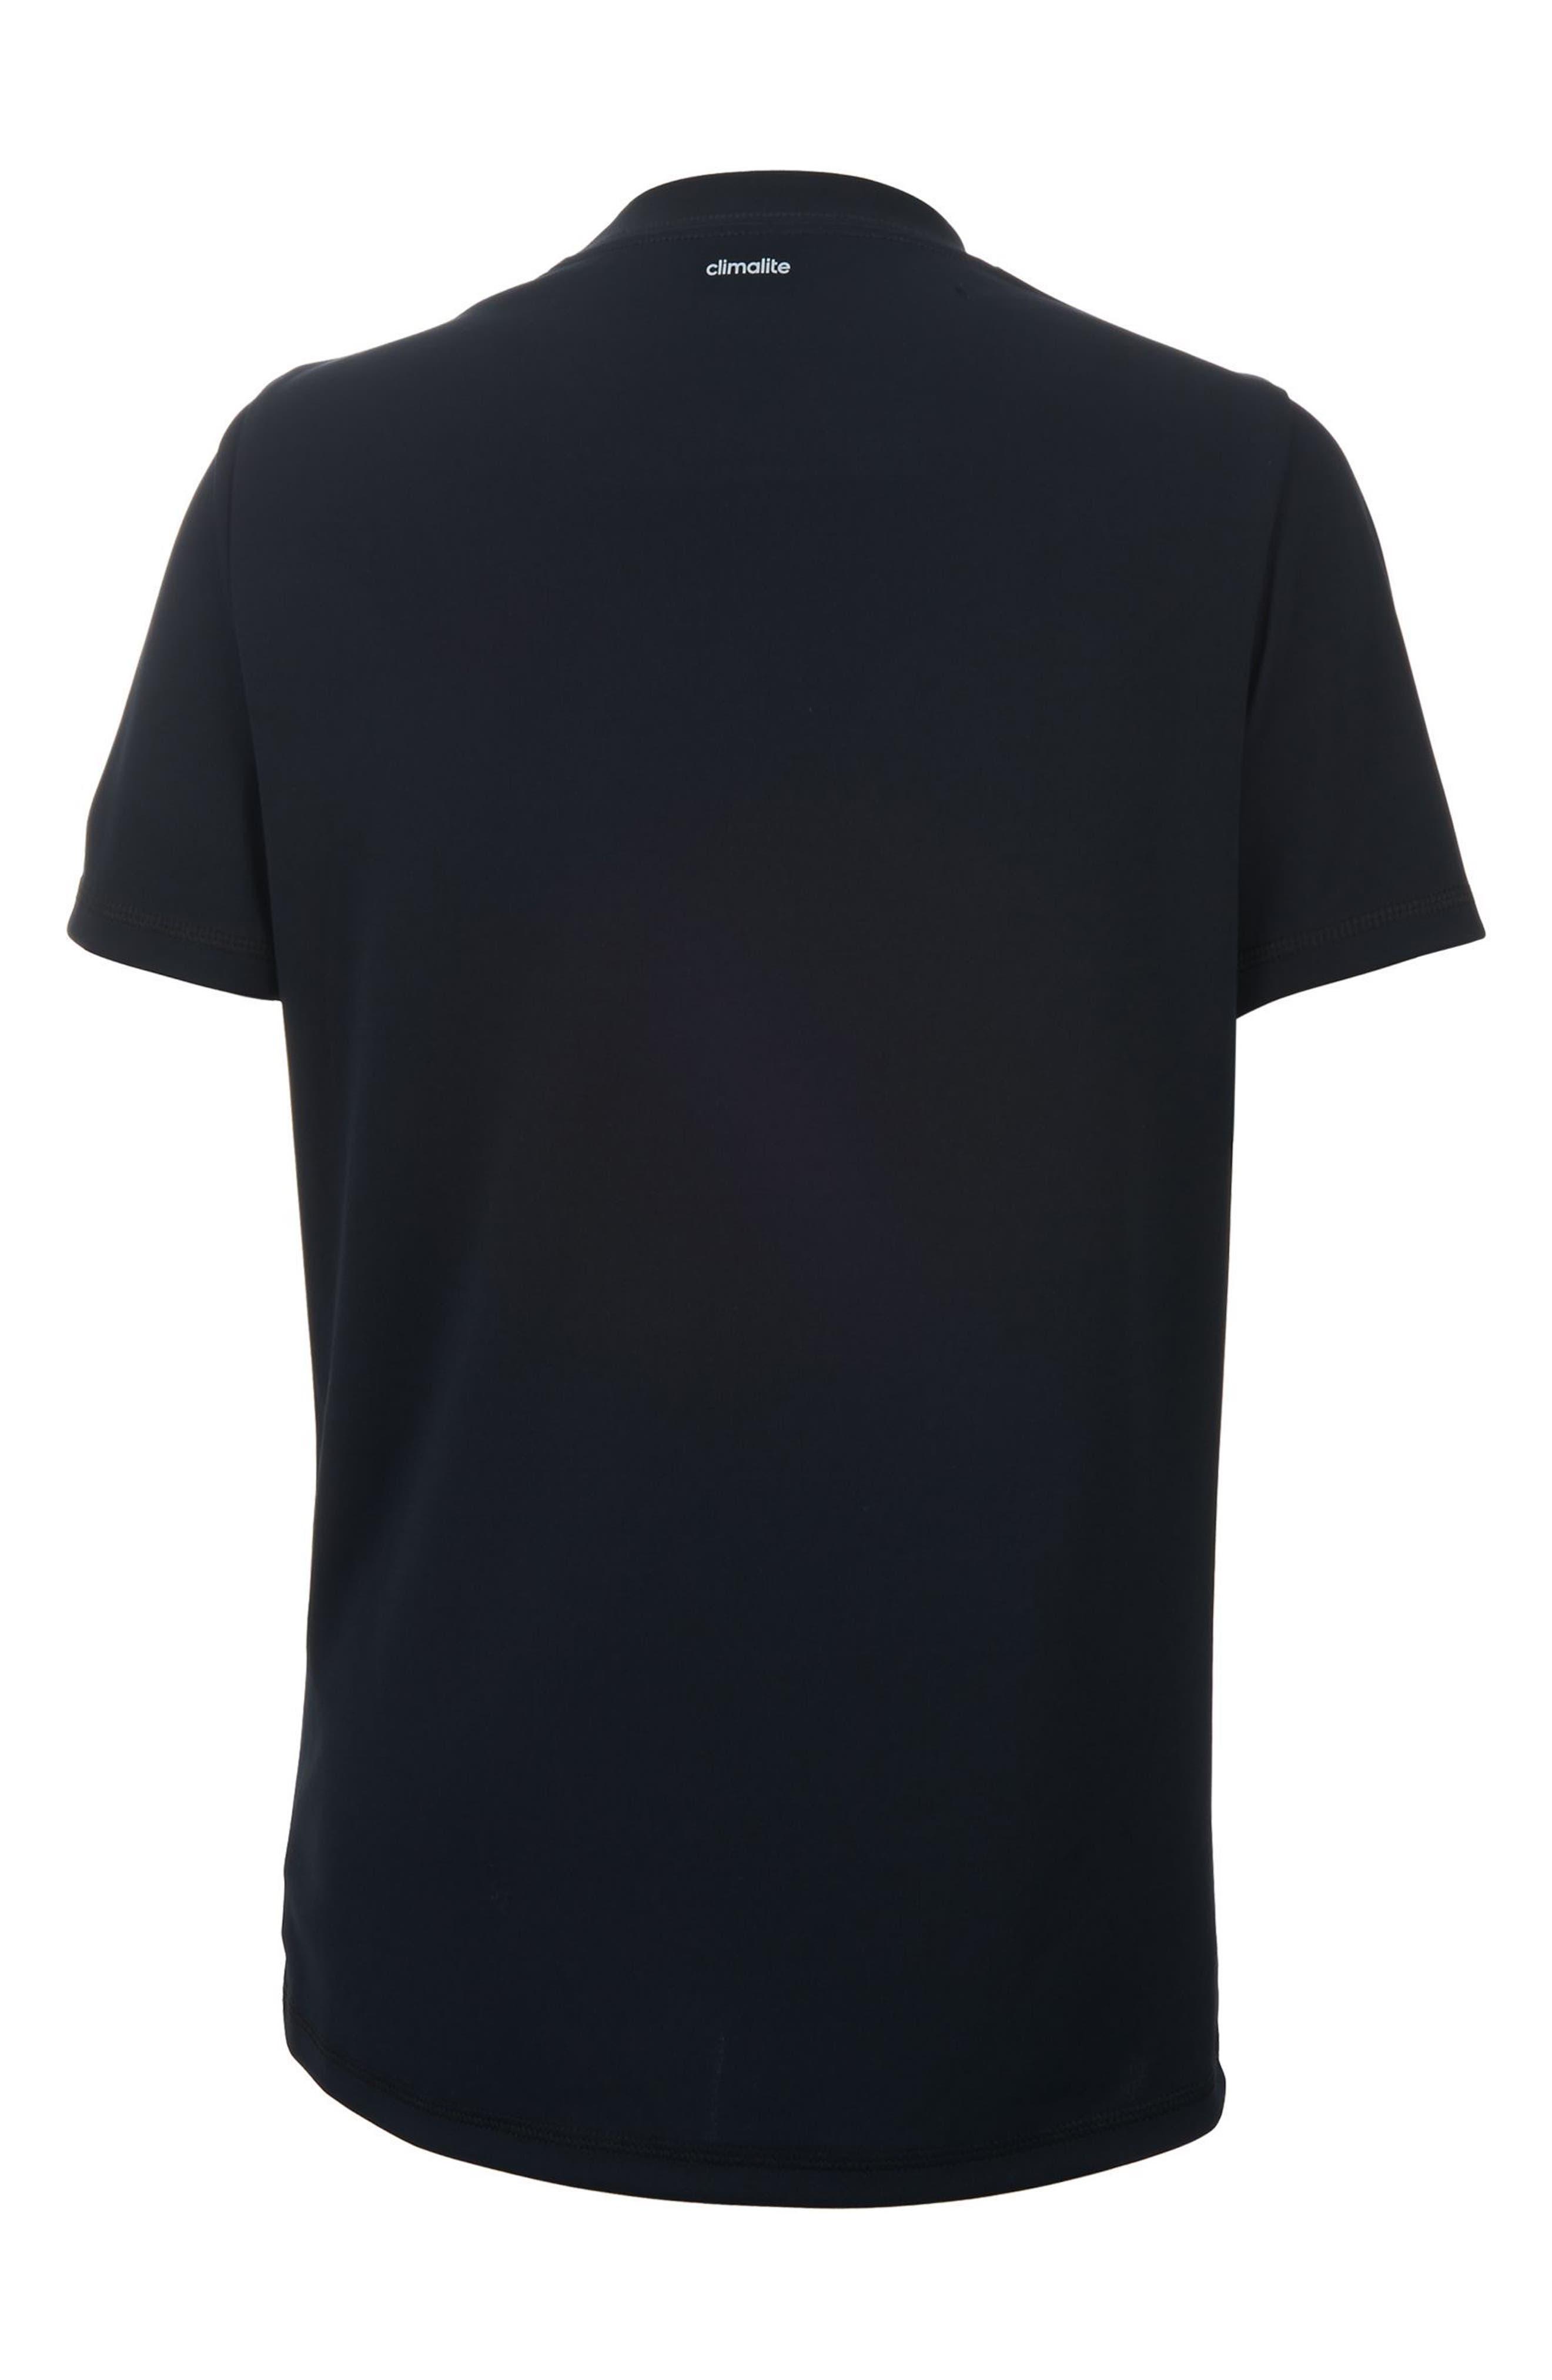 Replenish Climalite<sup>®</sup> T-Shirt,                             Alternate thumbnail 2, color,                             001